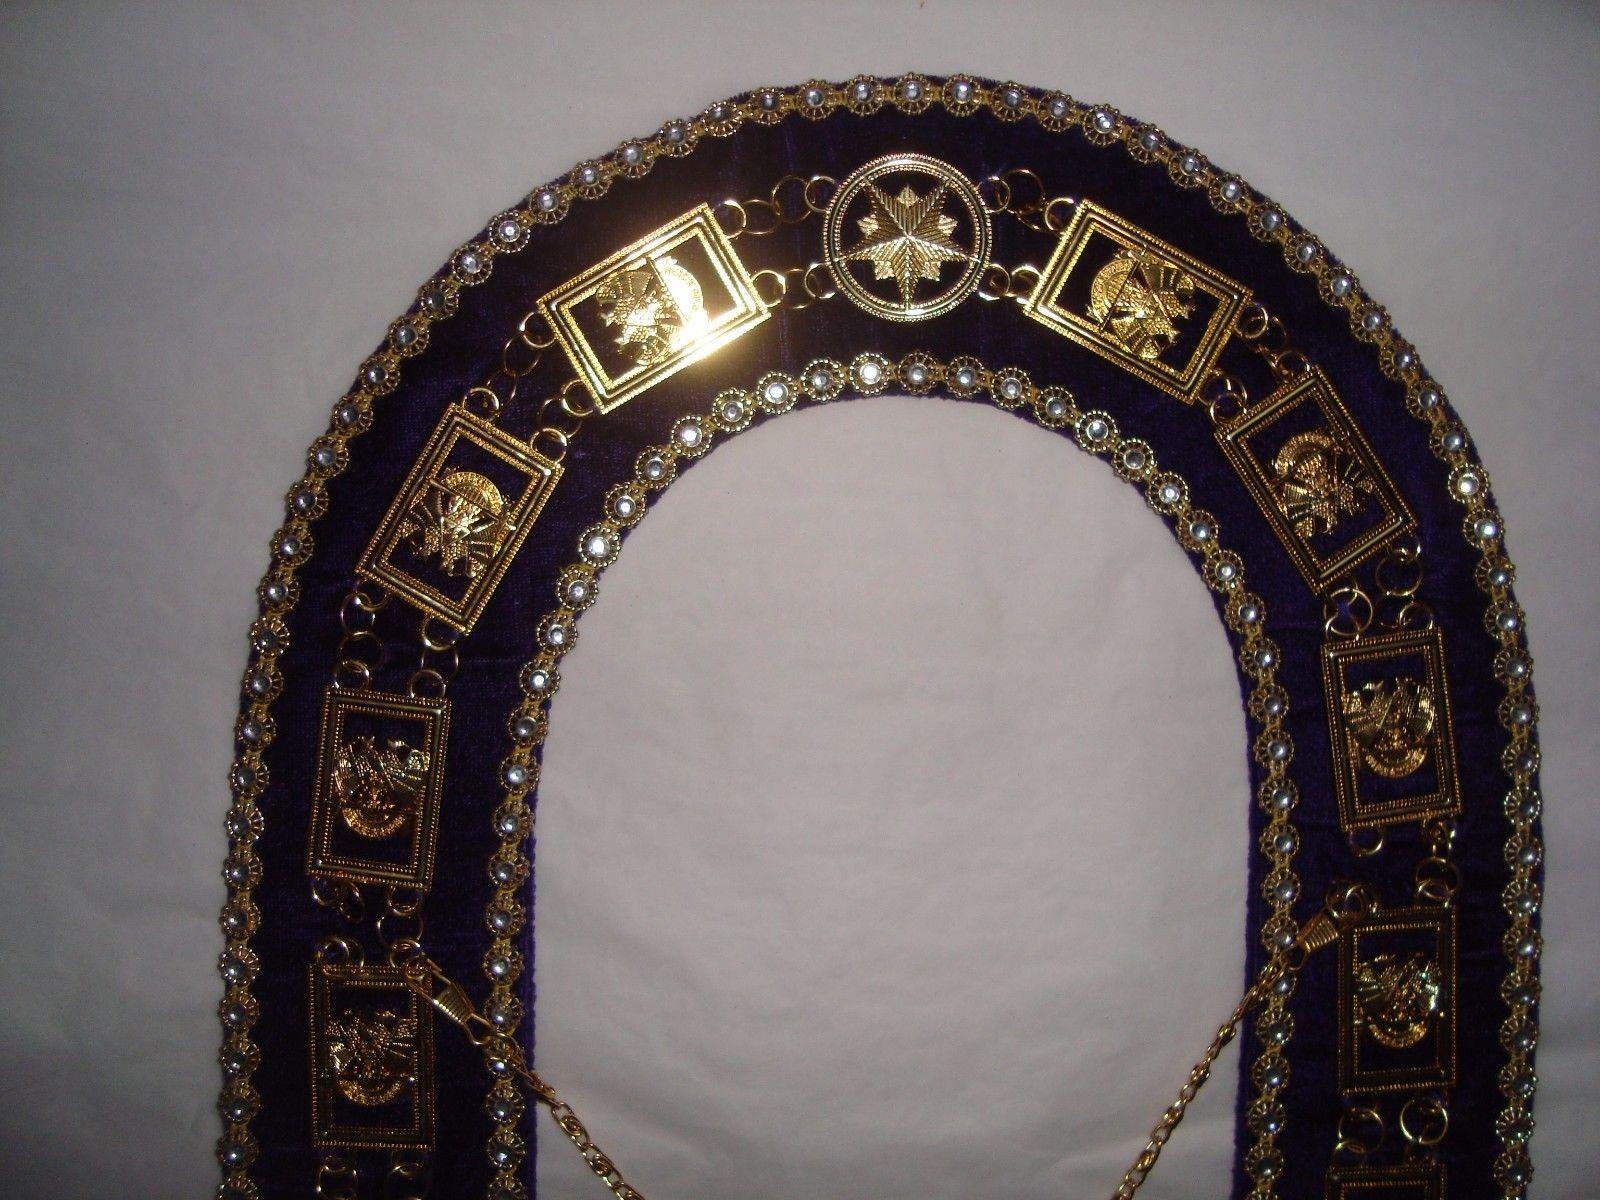 Masonic-Regalia-32-Degree-Scottish-Rite-Metal-Chain-_57